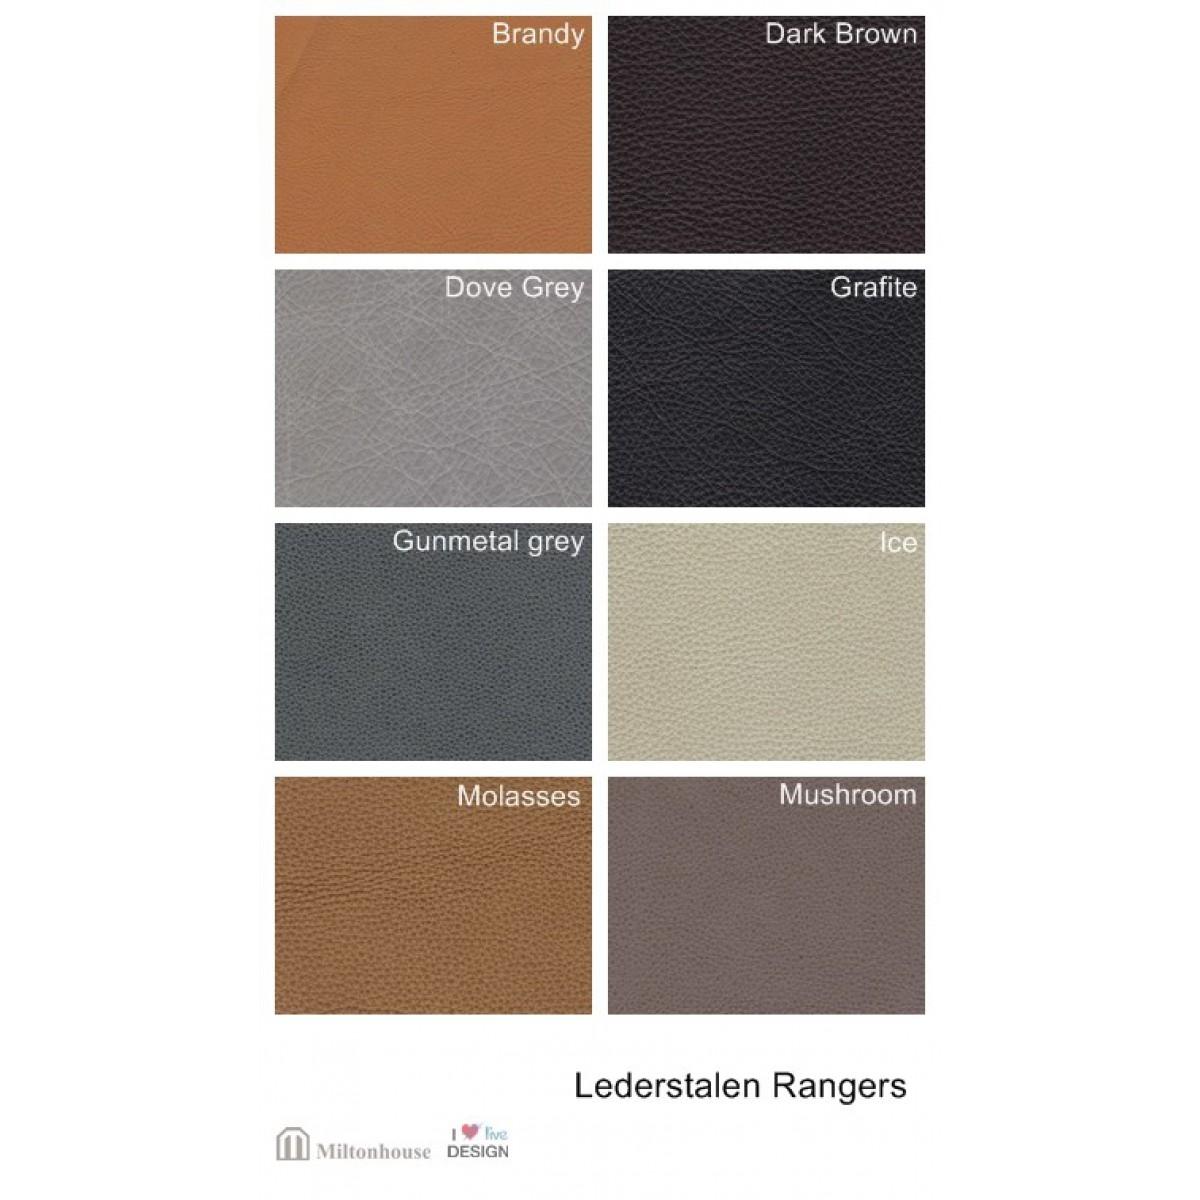 lederstalen-rangers-leder-het-anker-l'ancora-collections